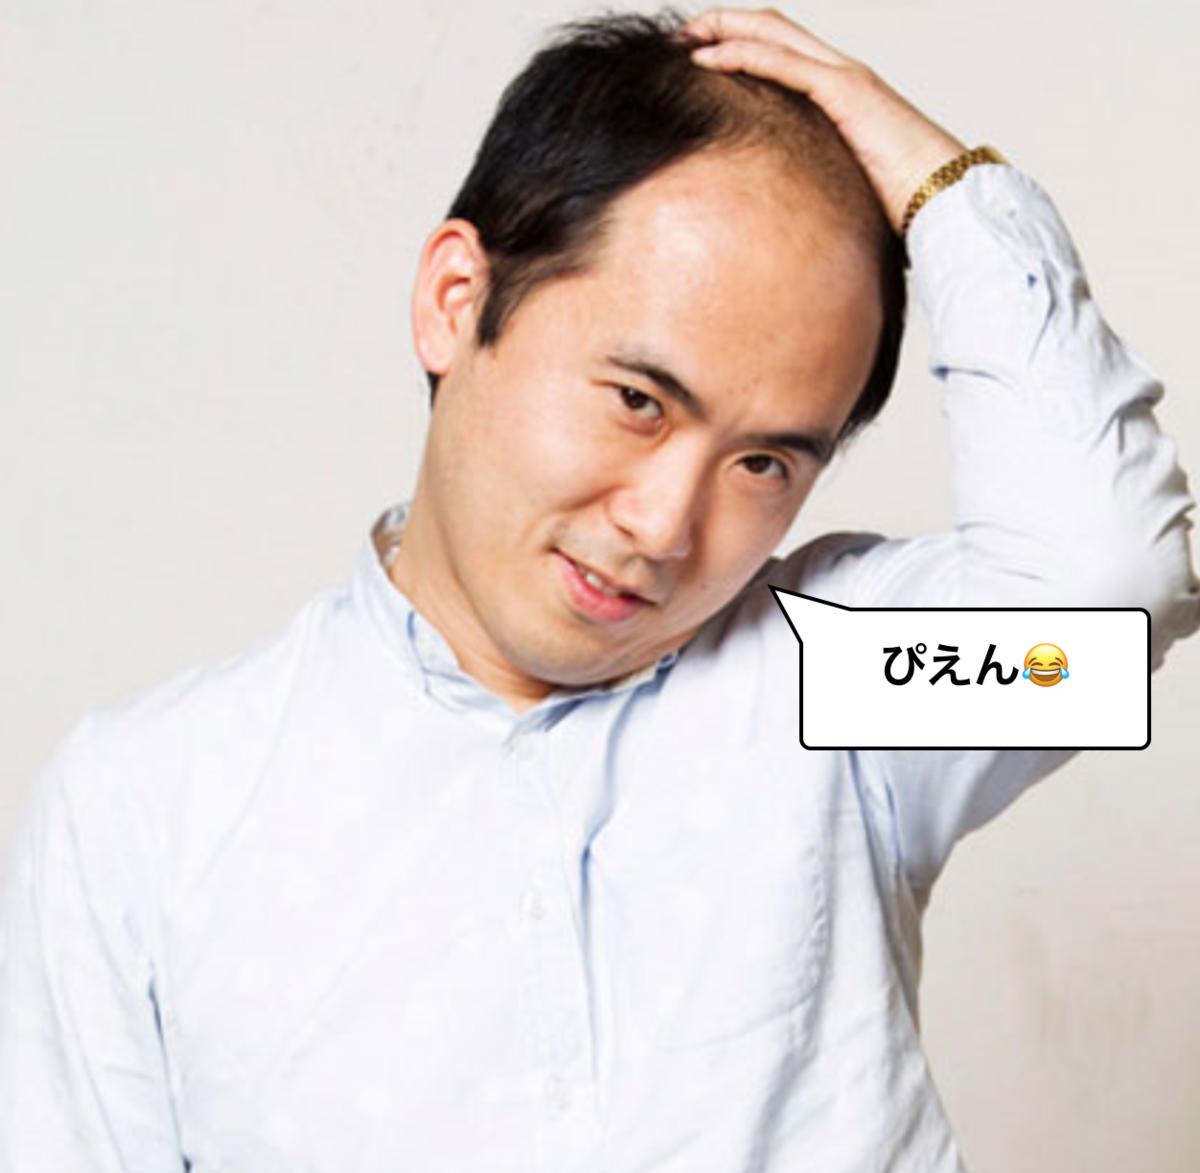 f:id:hideyoshi1537:20191111114015p:plain